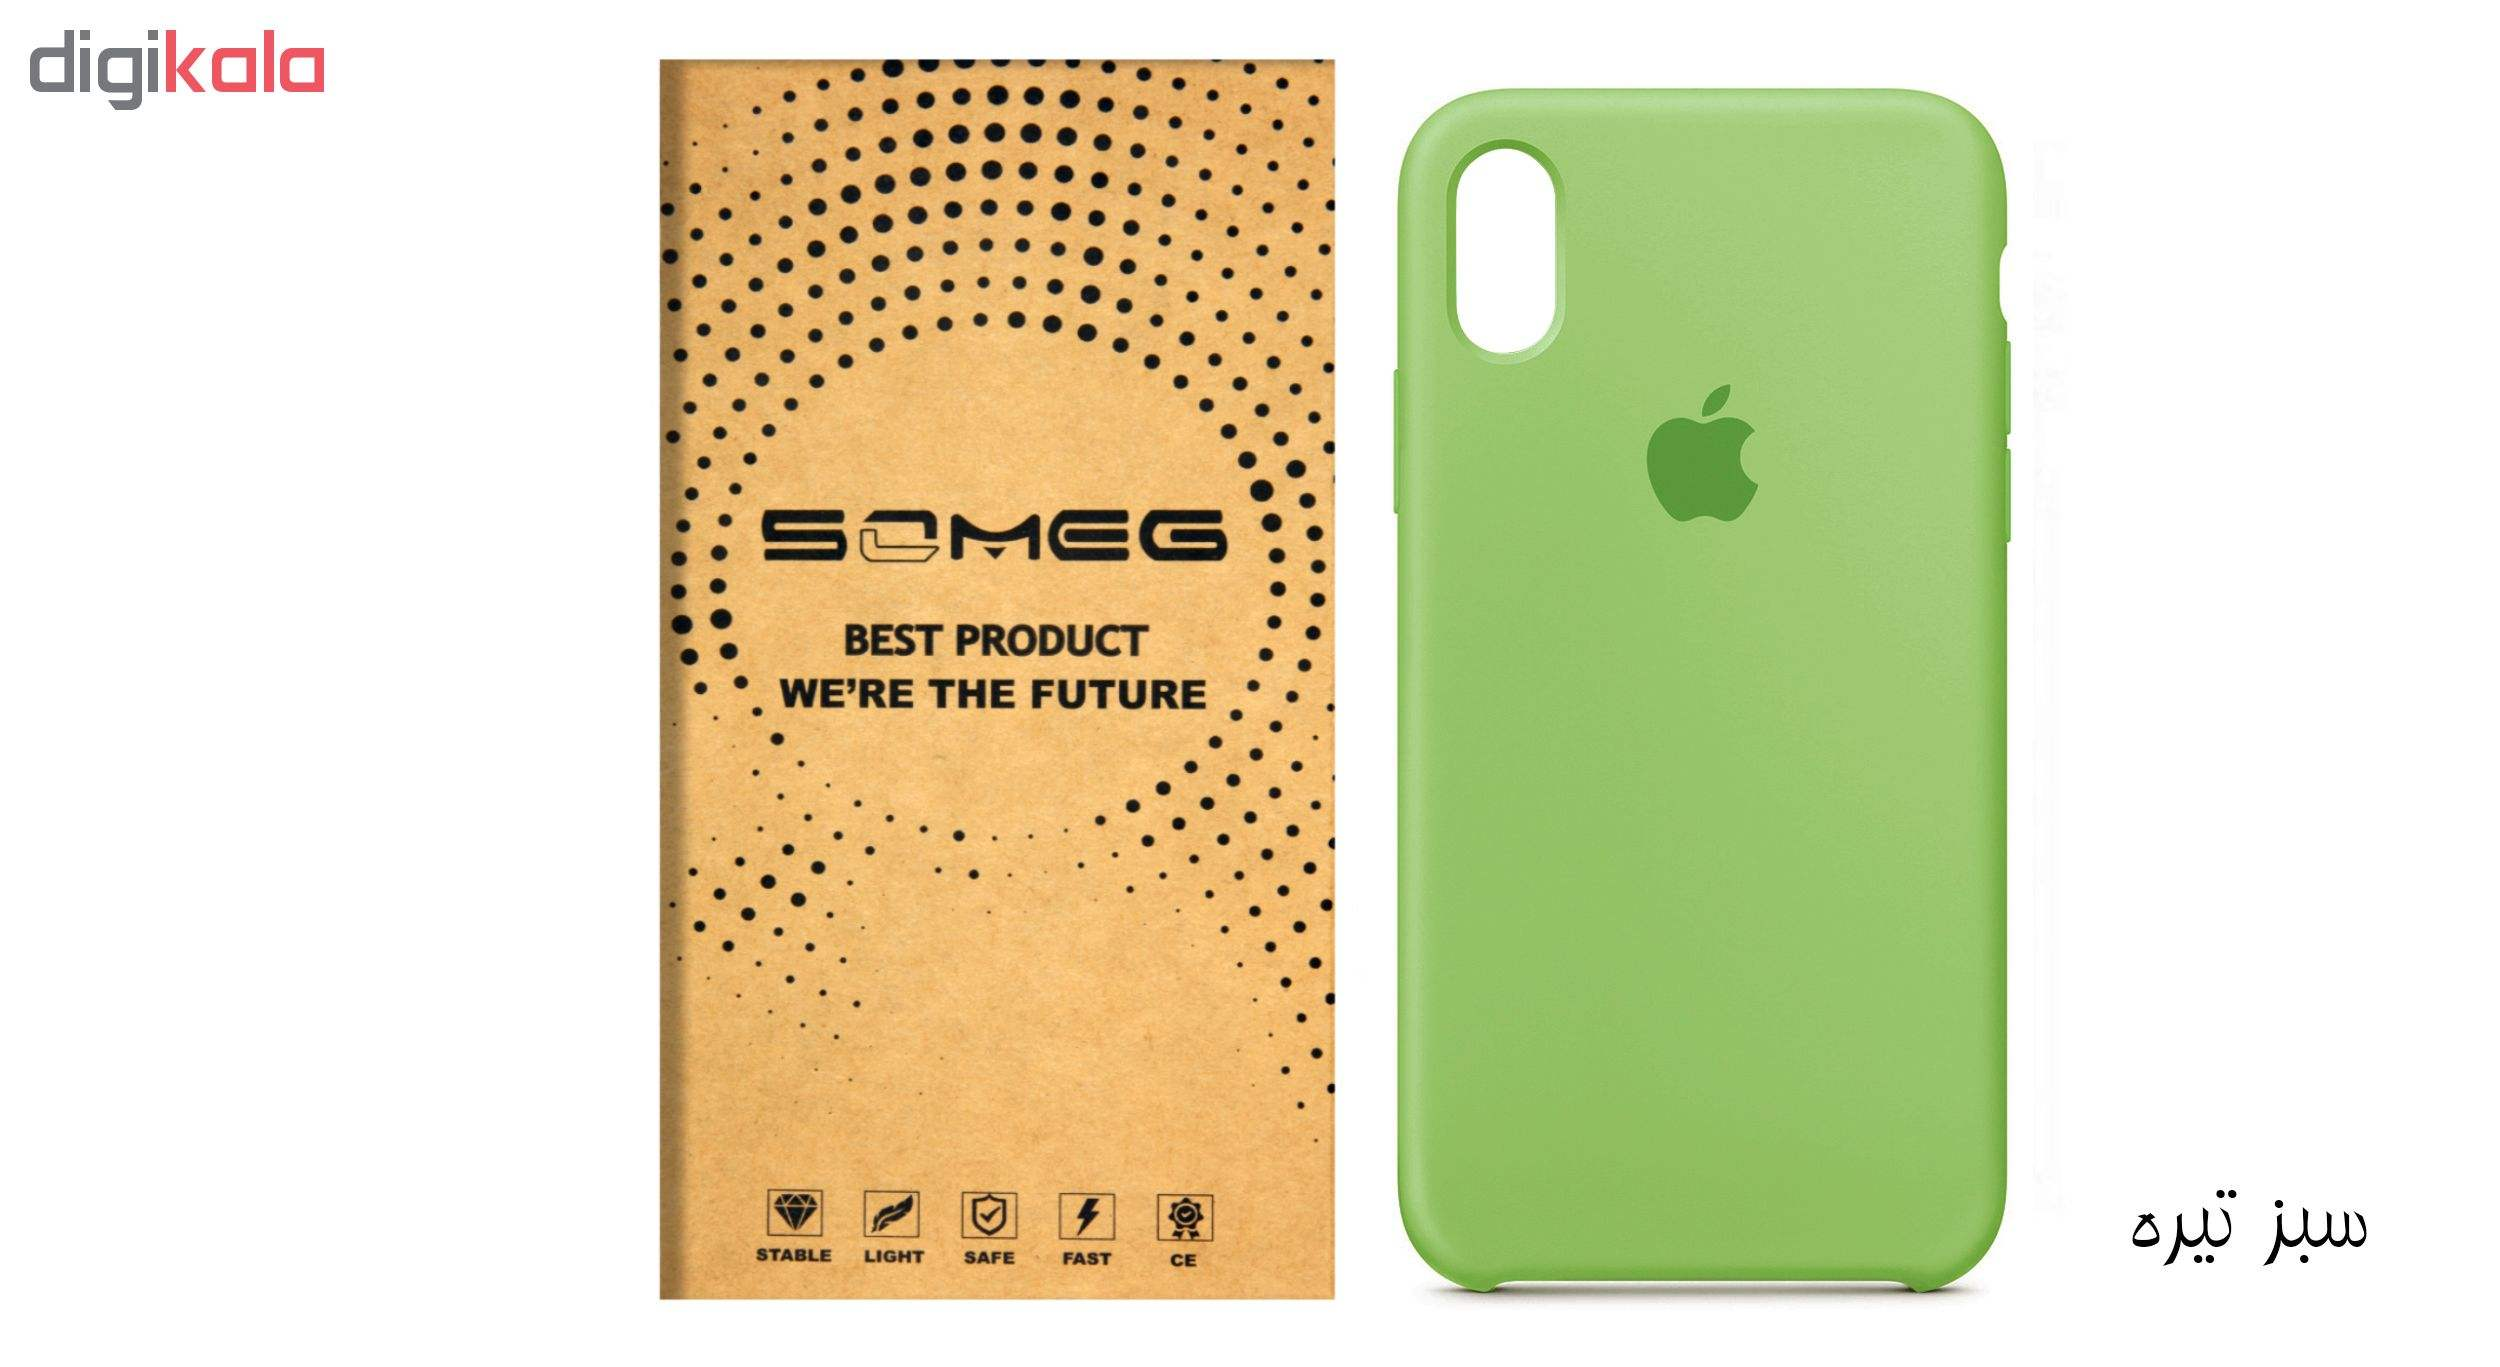 کاور سومگ مدل SIC مناسب برای گوشی موبایل اپل iPhone X  main 1 8